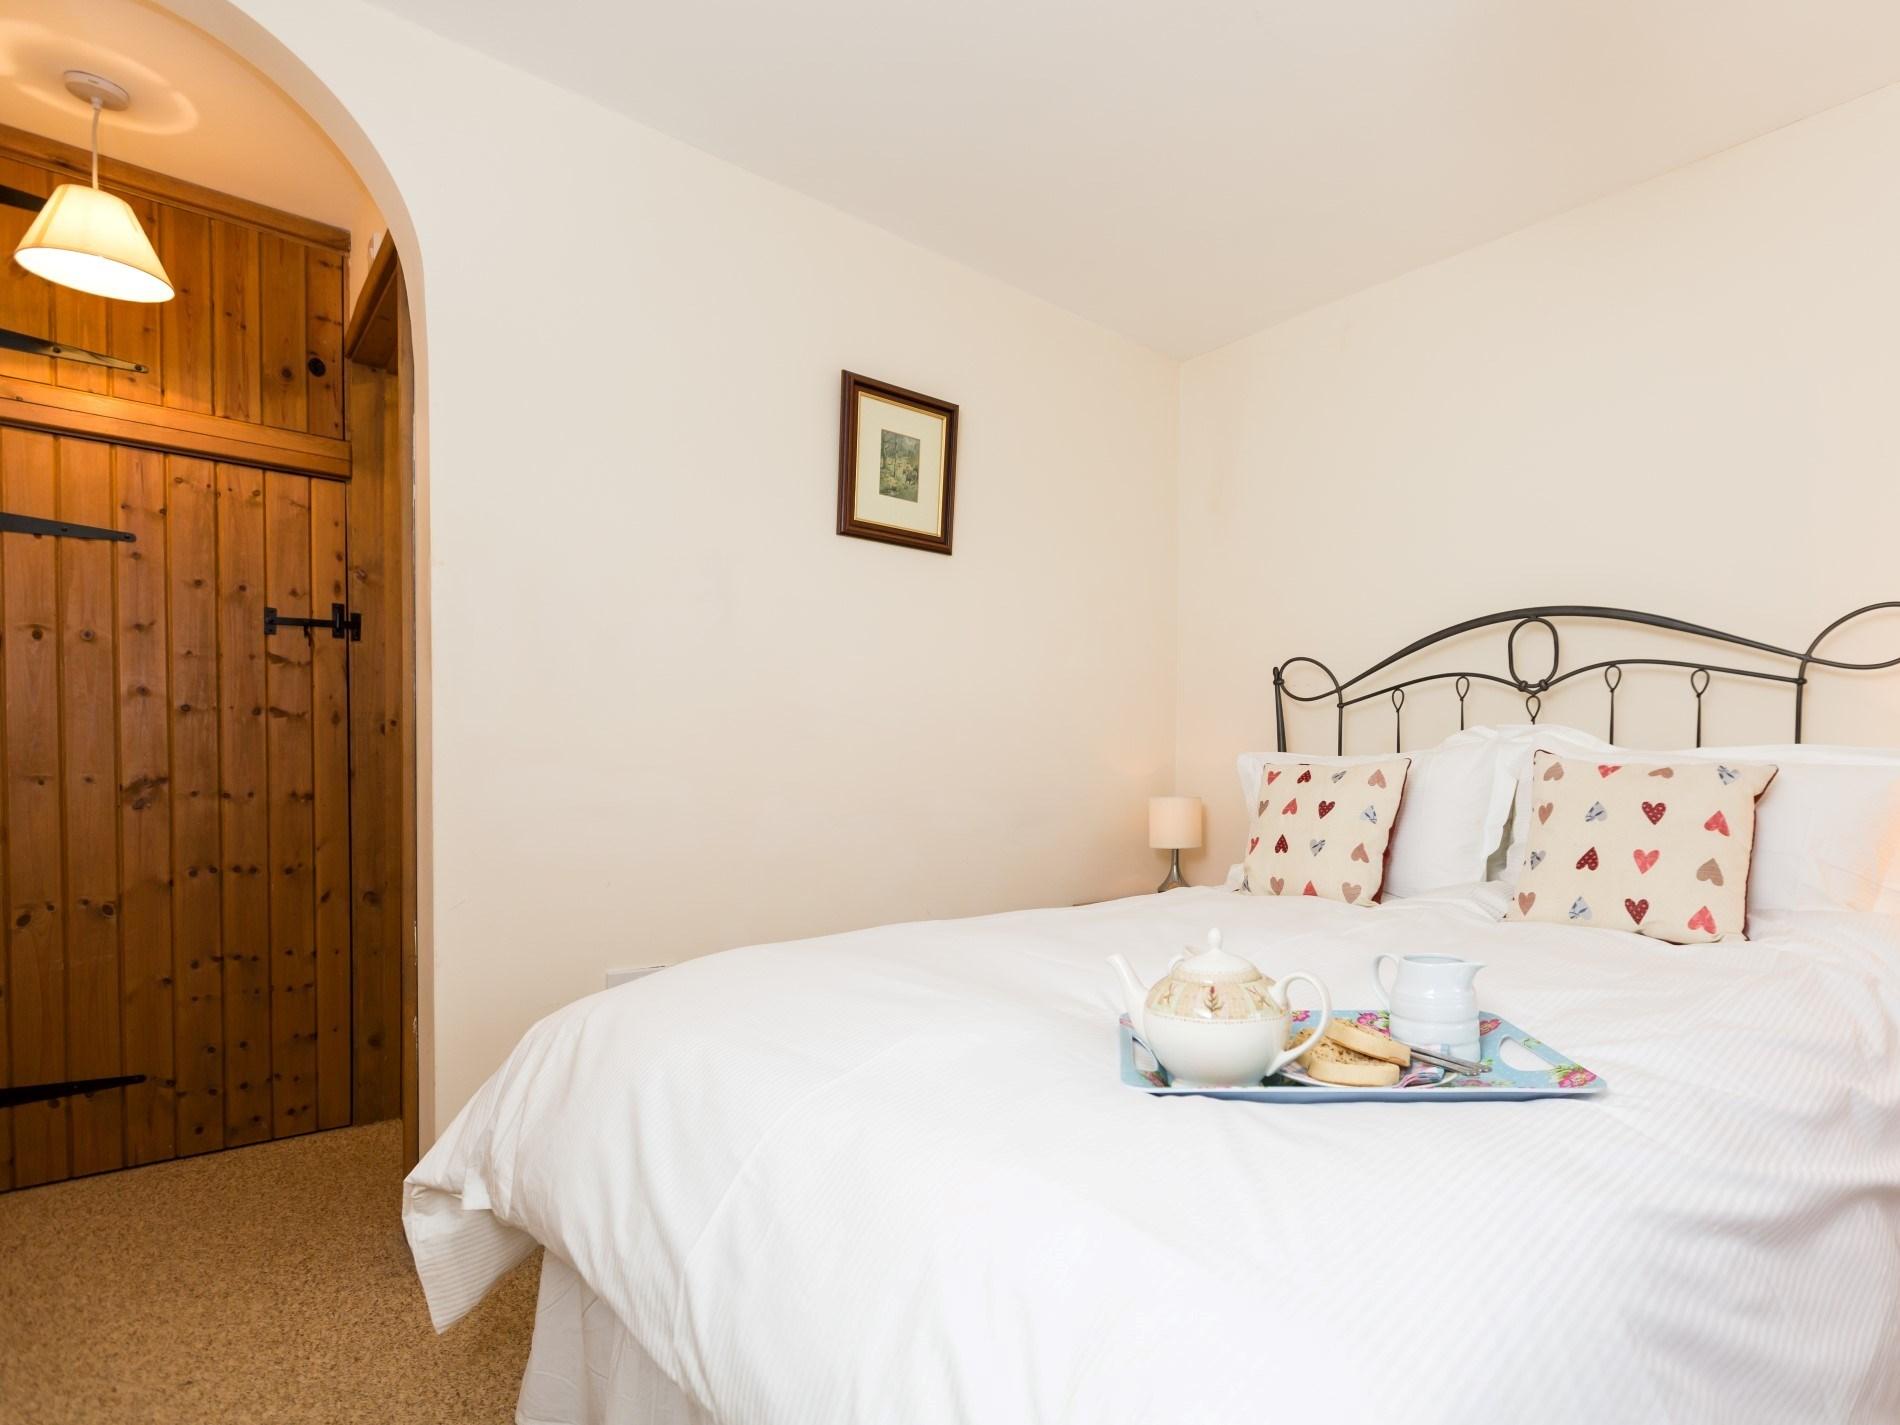 Cosy double bedroom on the ground floor with en suite facilities